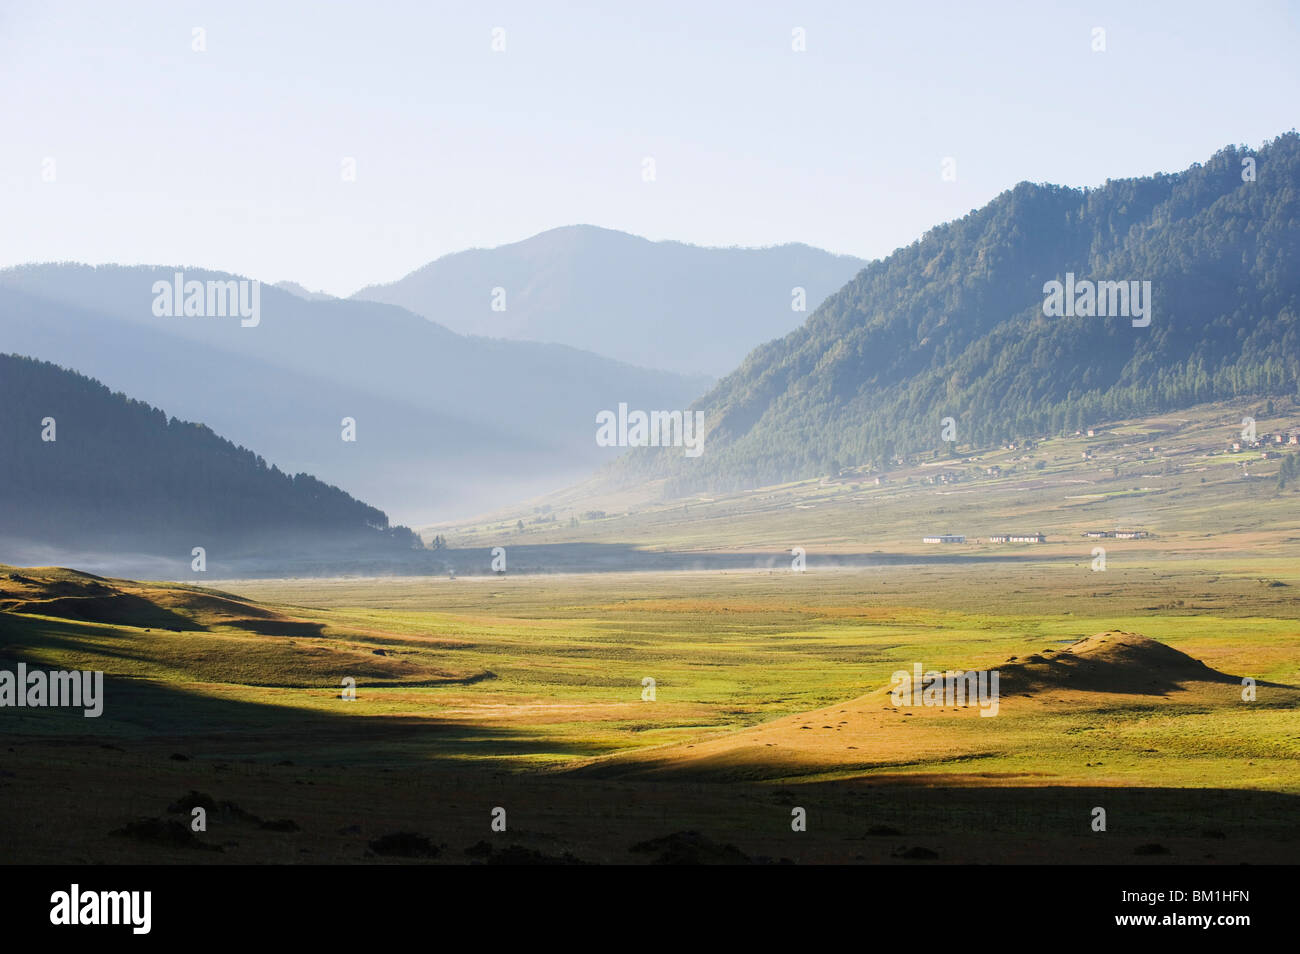 Phobjikha Valley, Bhutan, Himalayas, Asia - Stock Image